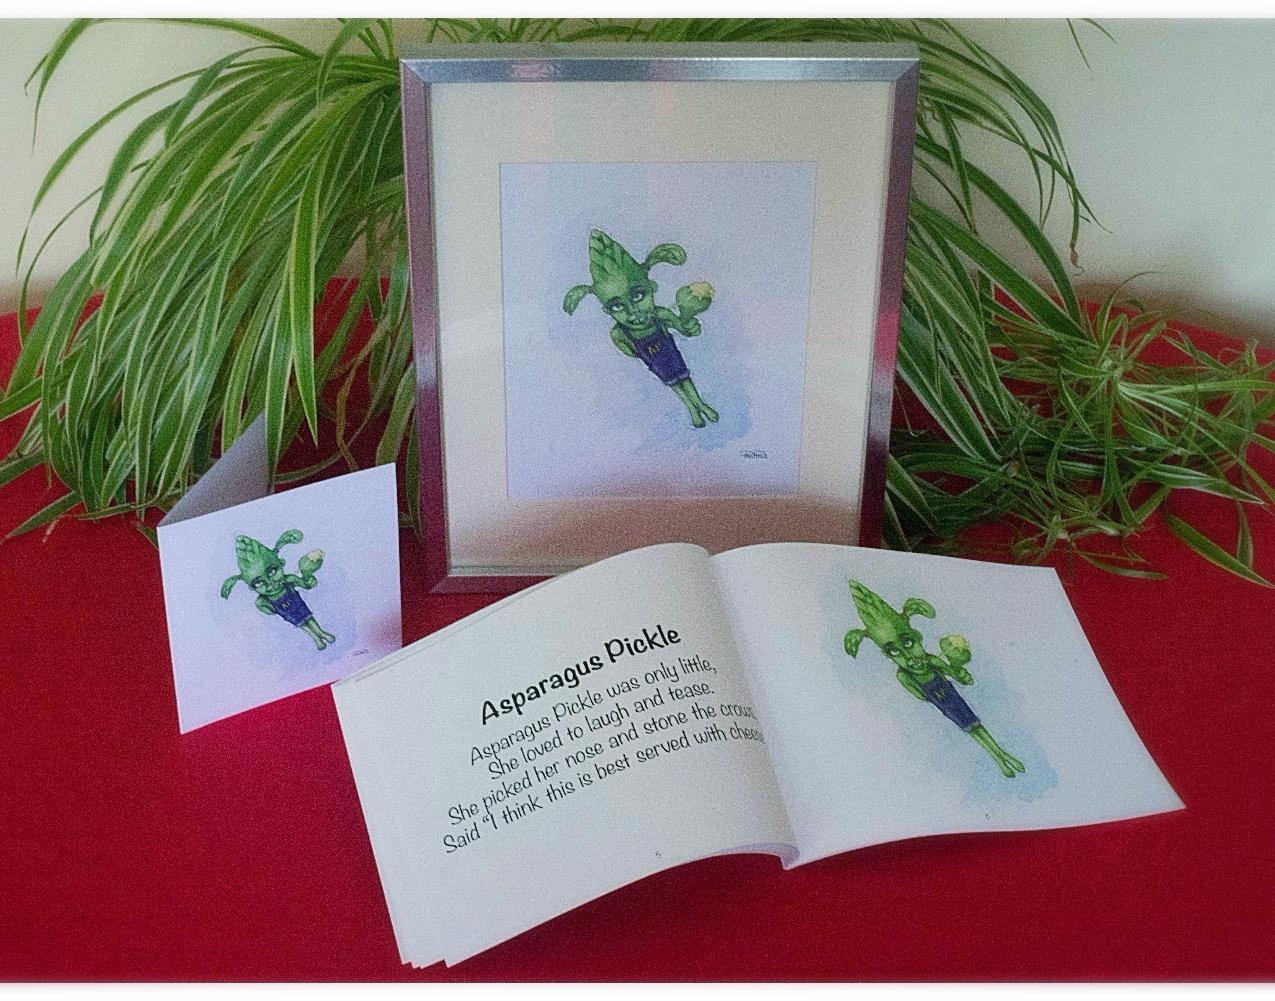 Asparagus Pickle Gift Set